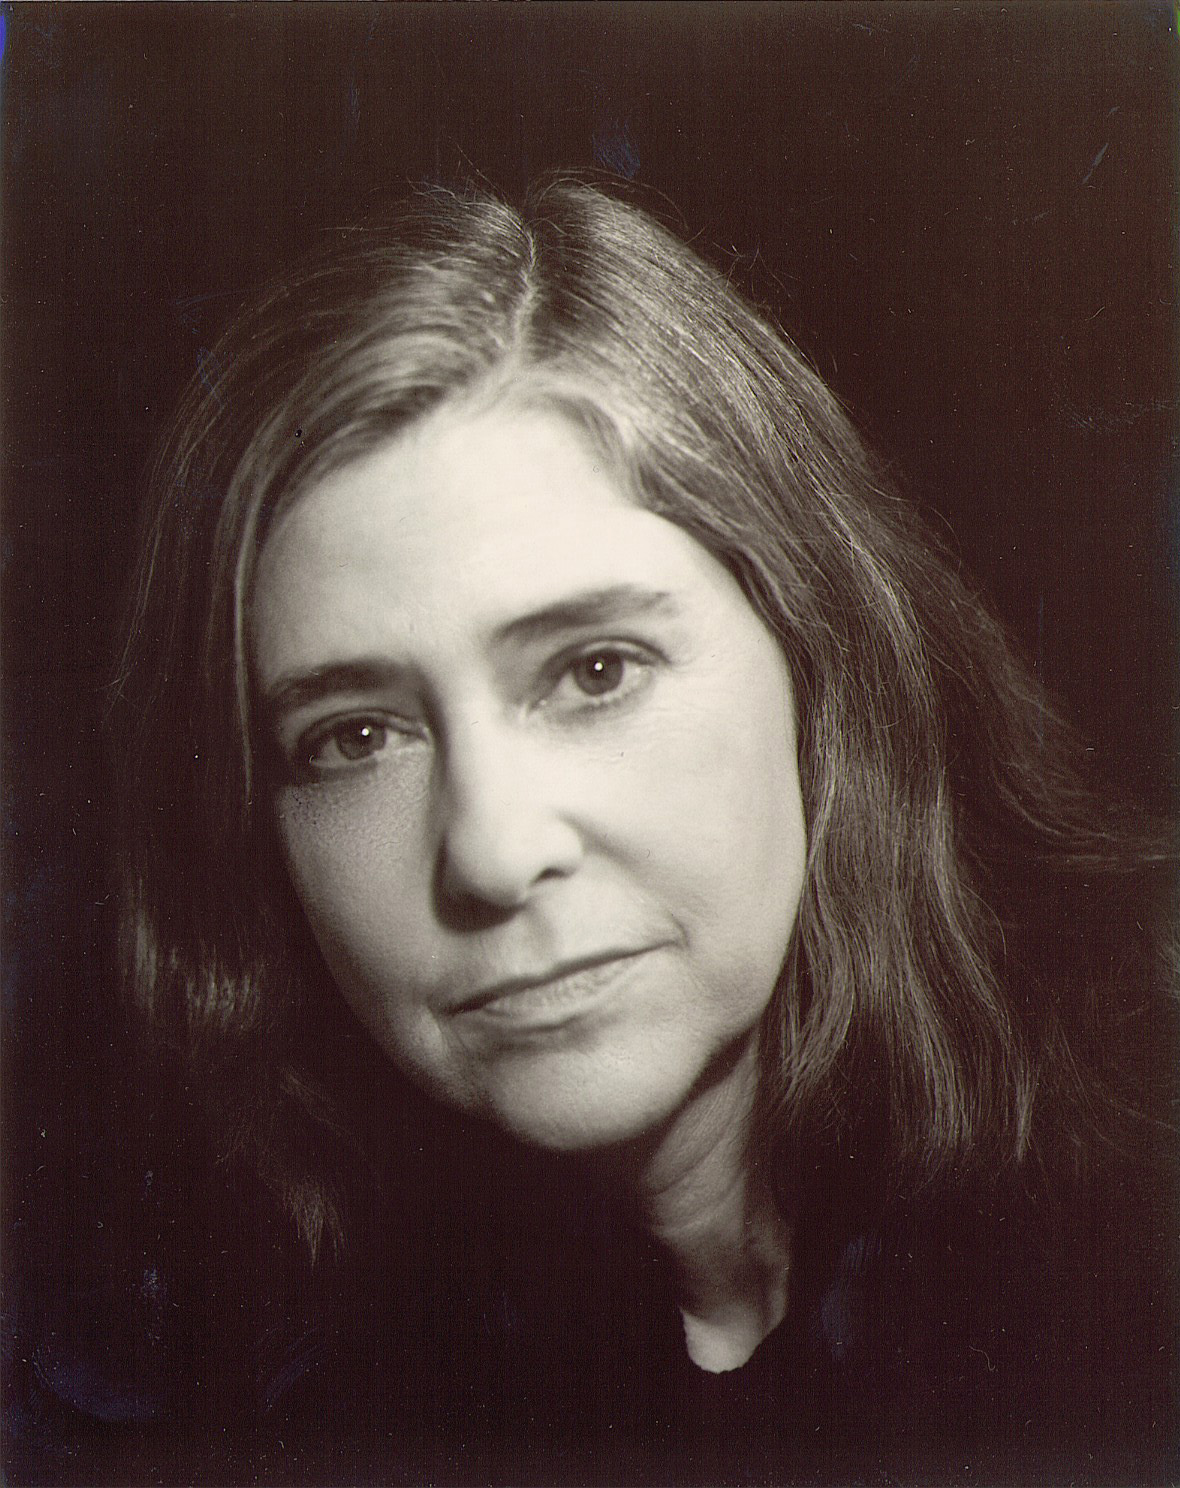 Margaret Hamilton Net Worth